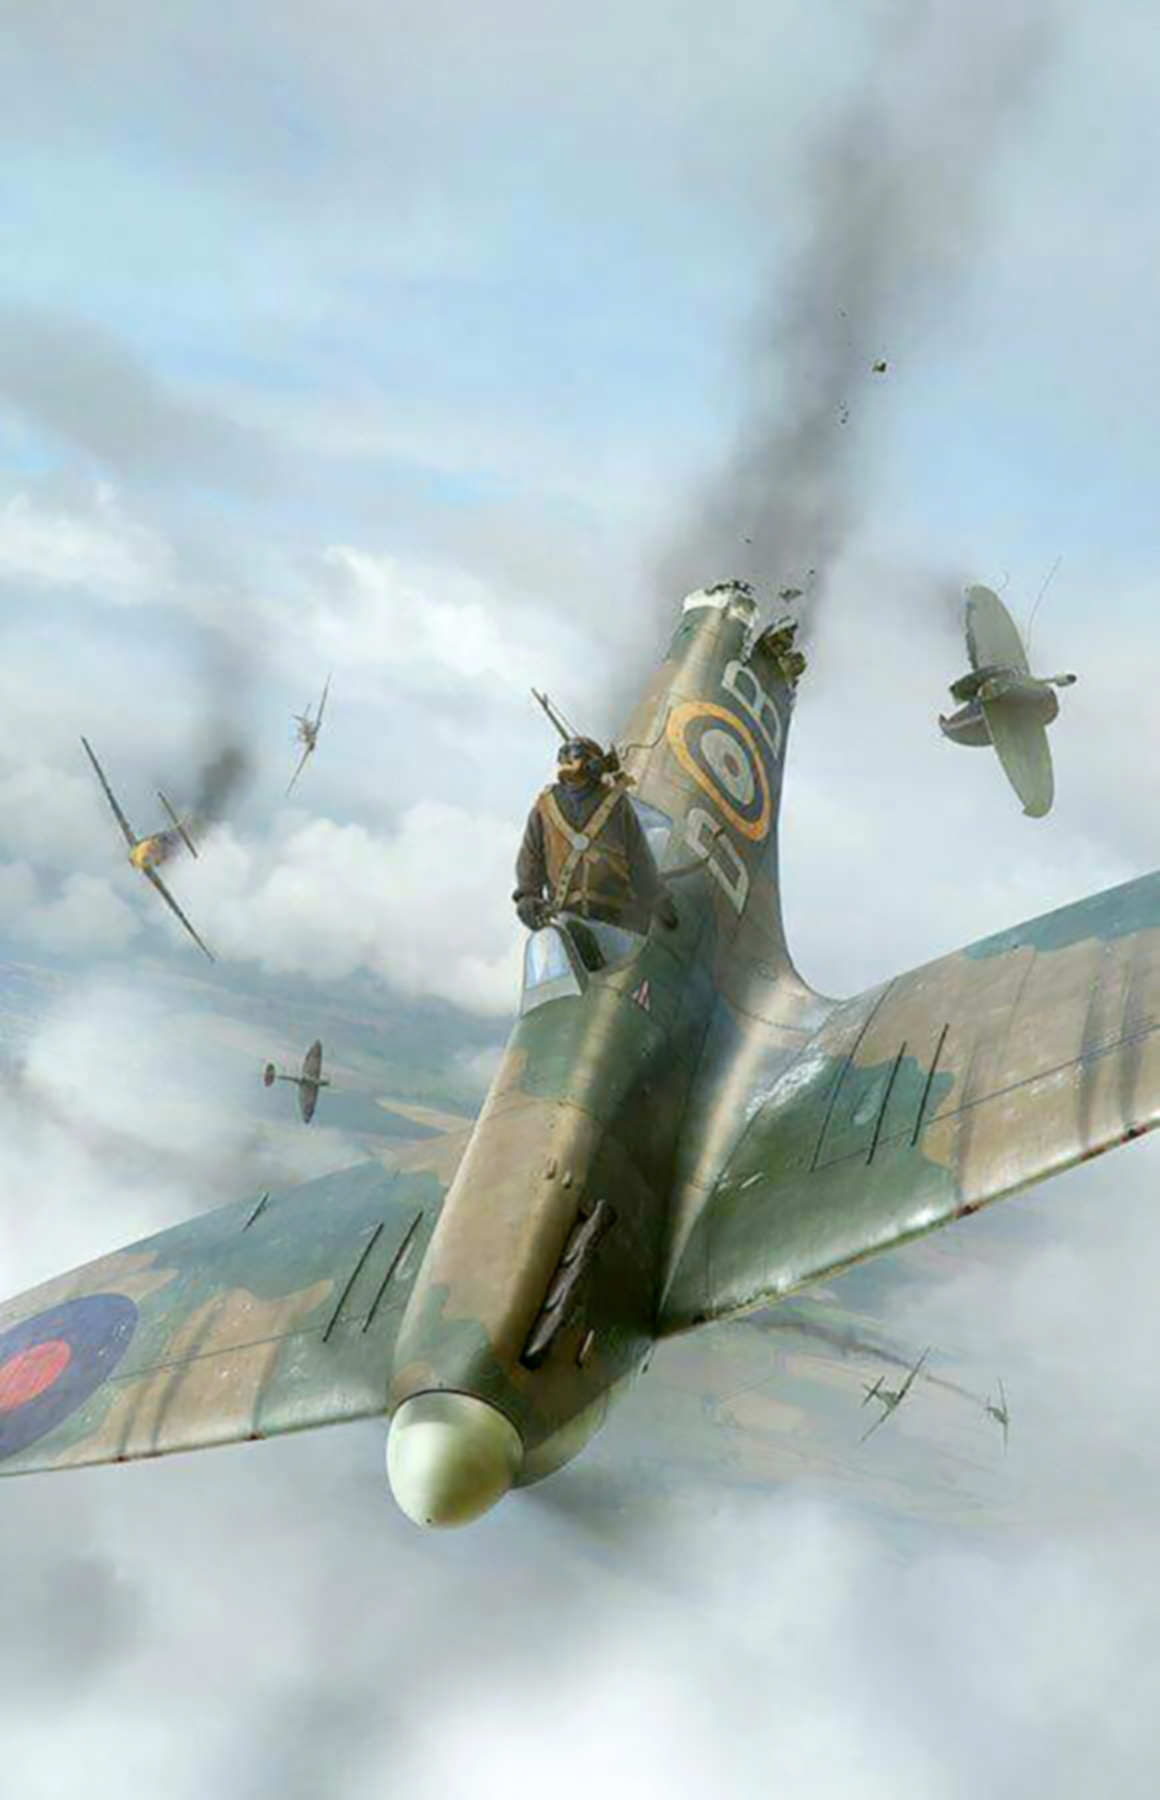 Spitfire MkIa RAF Tangmere Wing DB Douglas Bader Tangmere 1941 0A